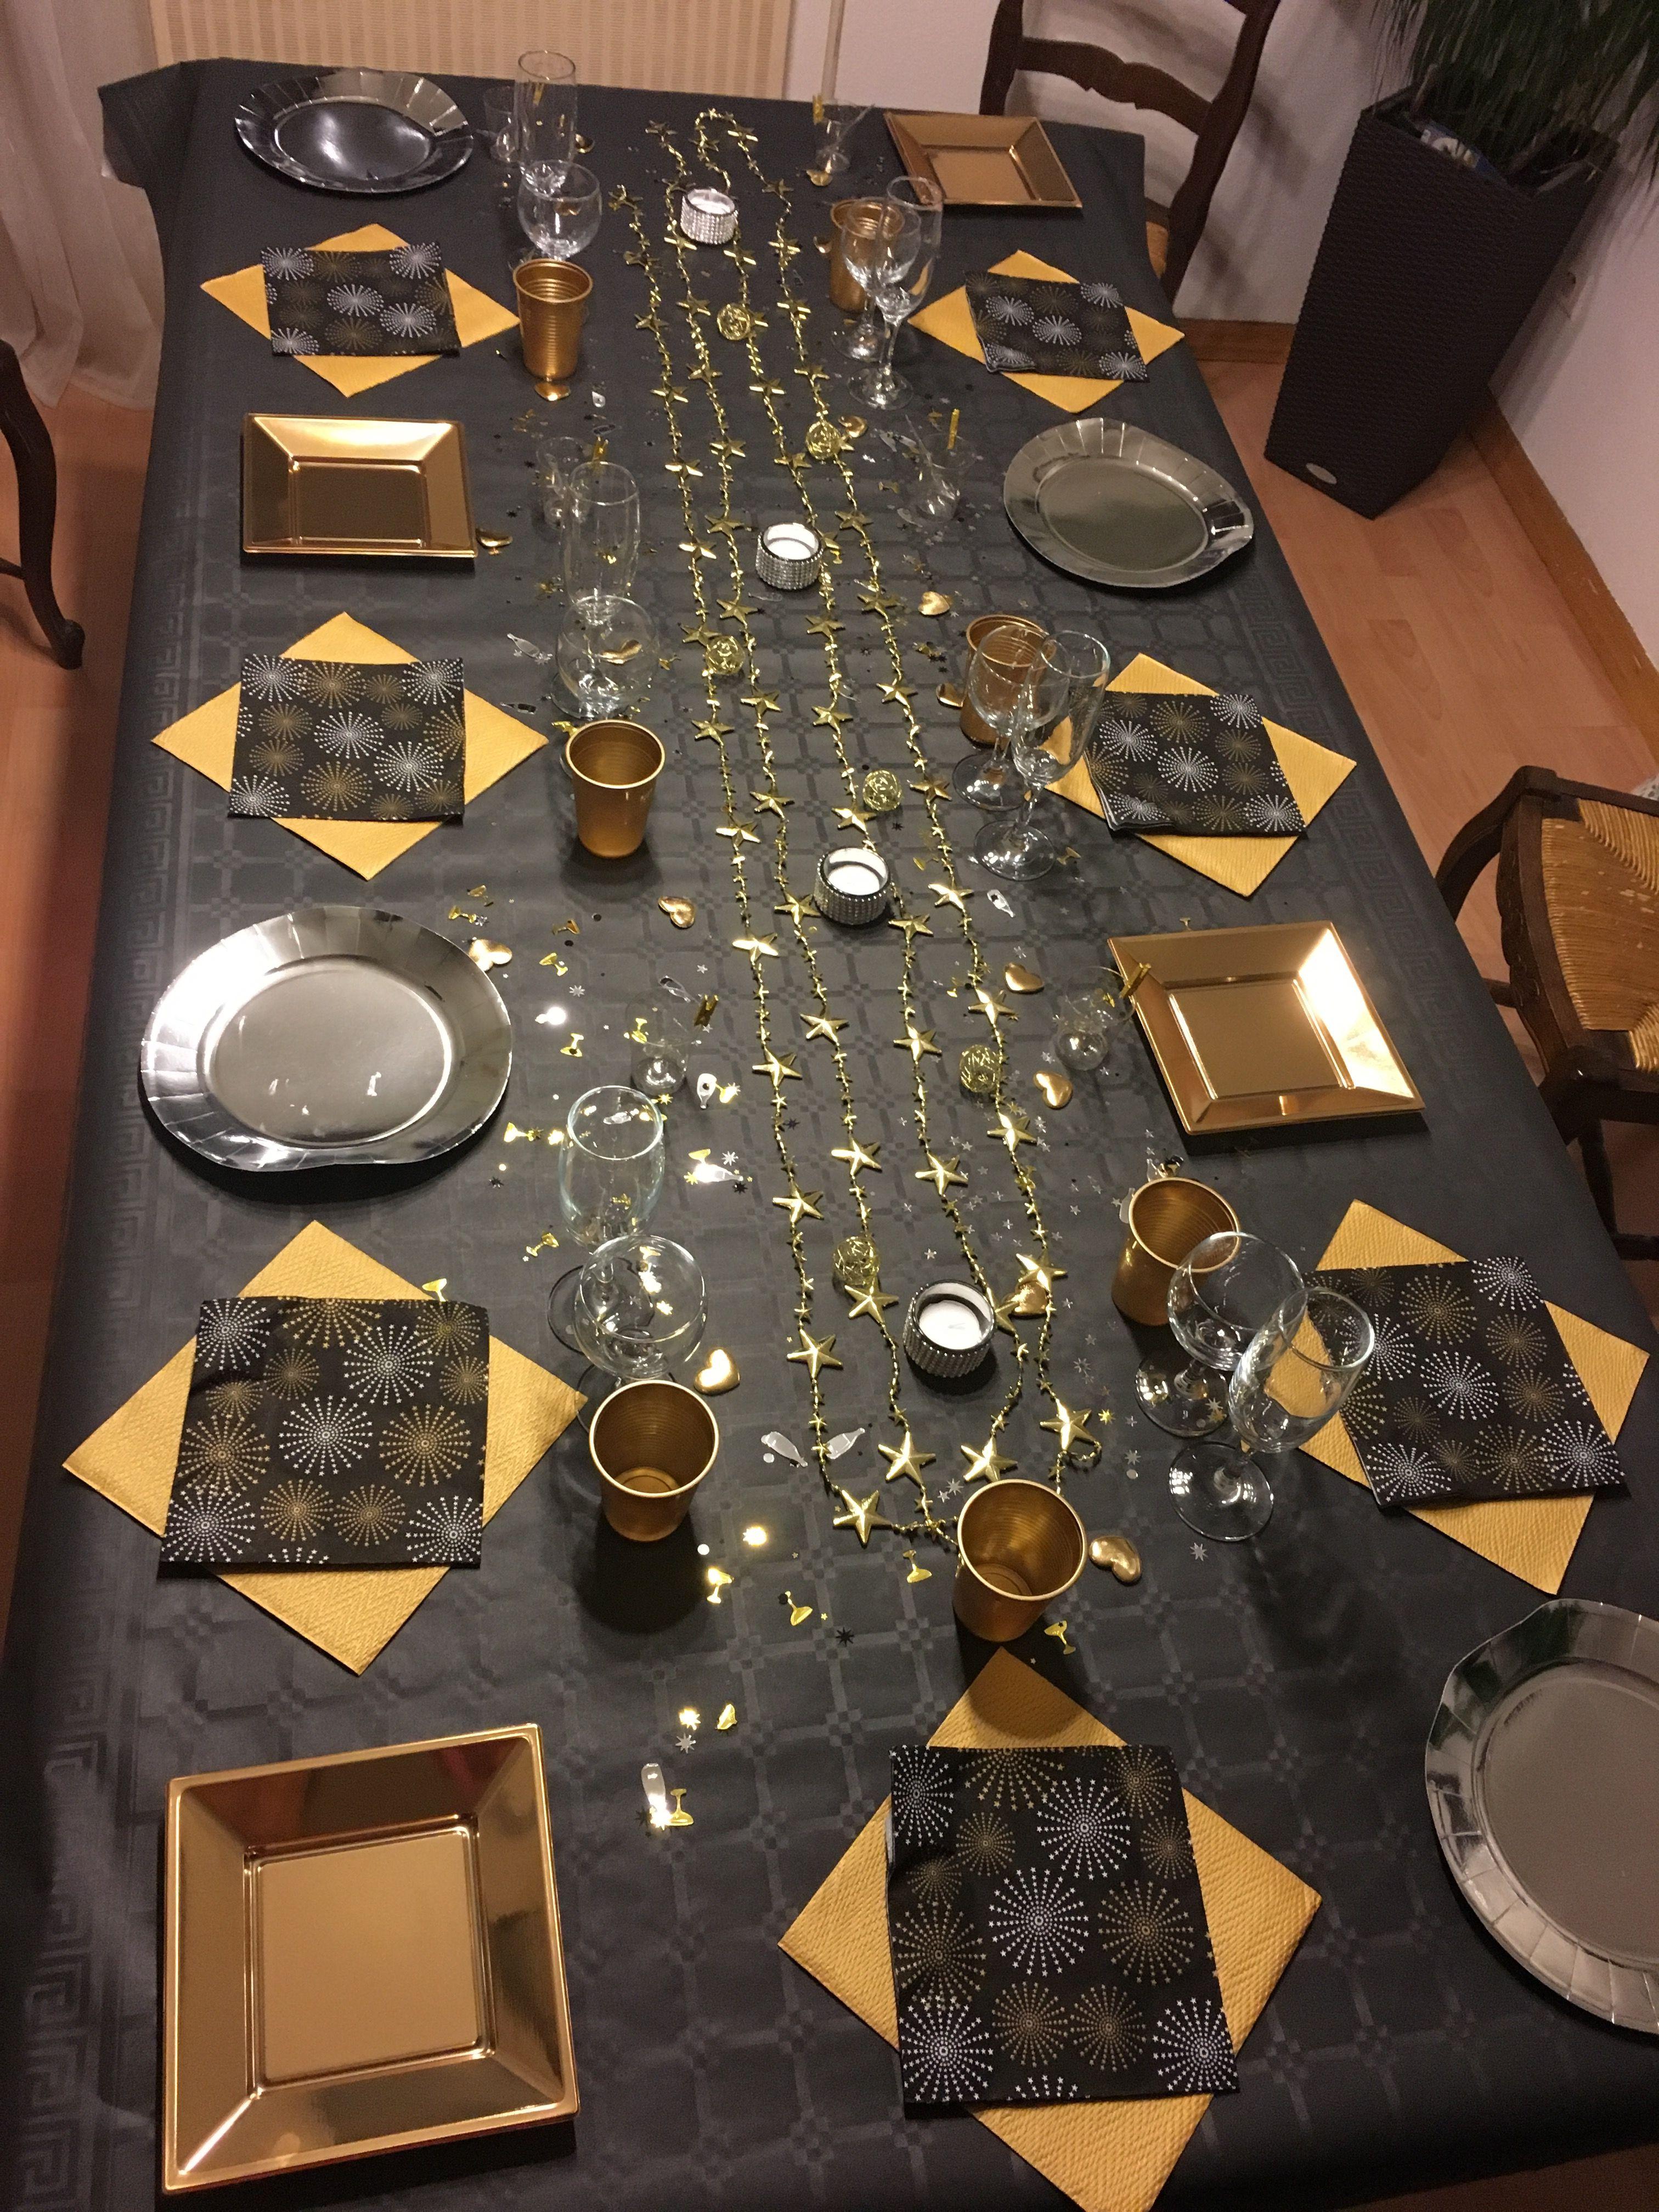 Table réveillon noir or argent  Graduation party table, New years